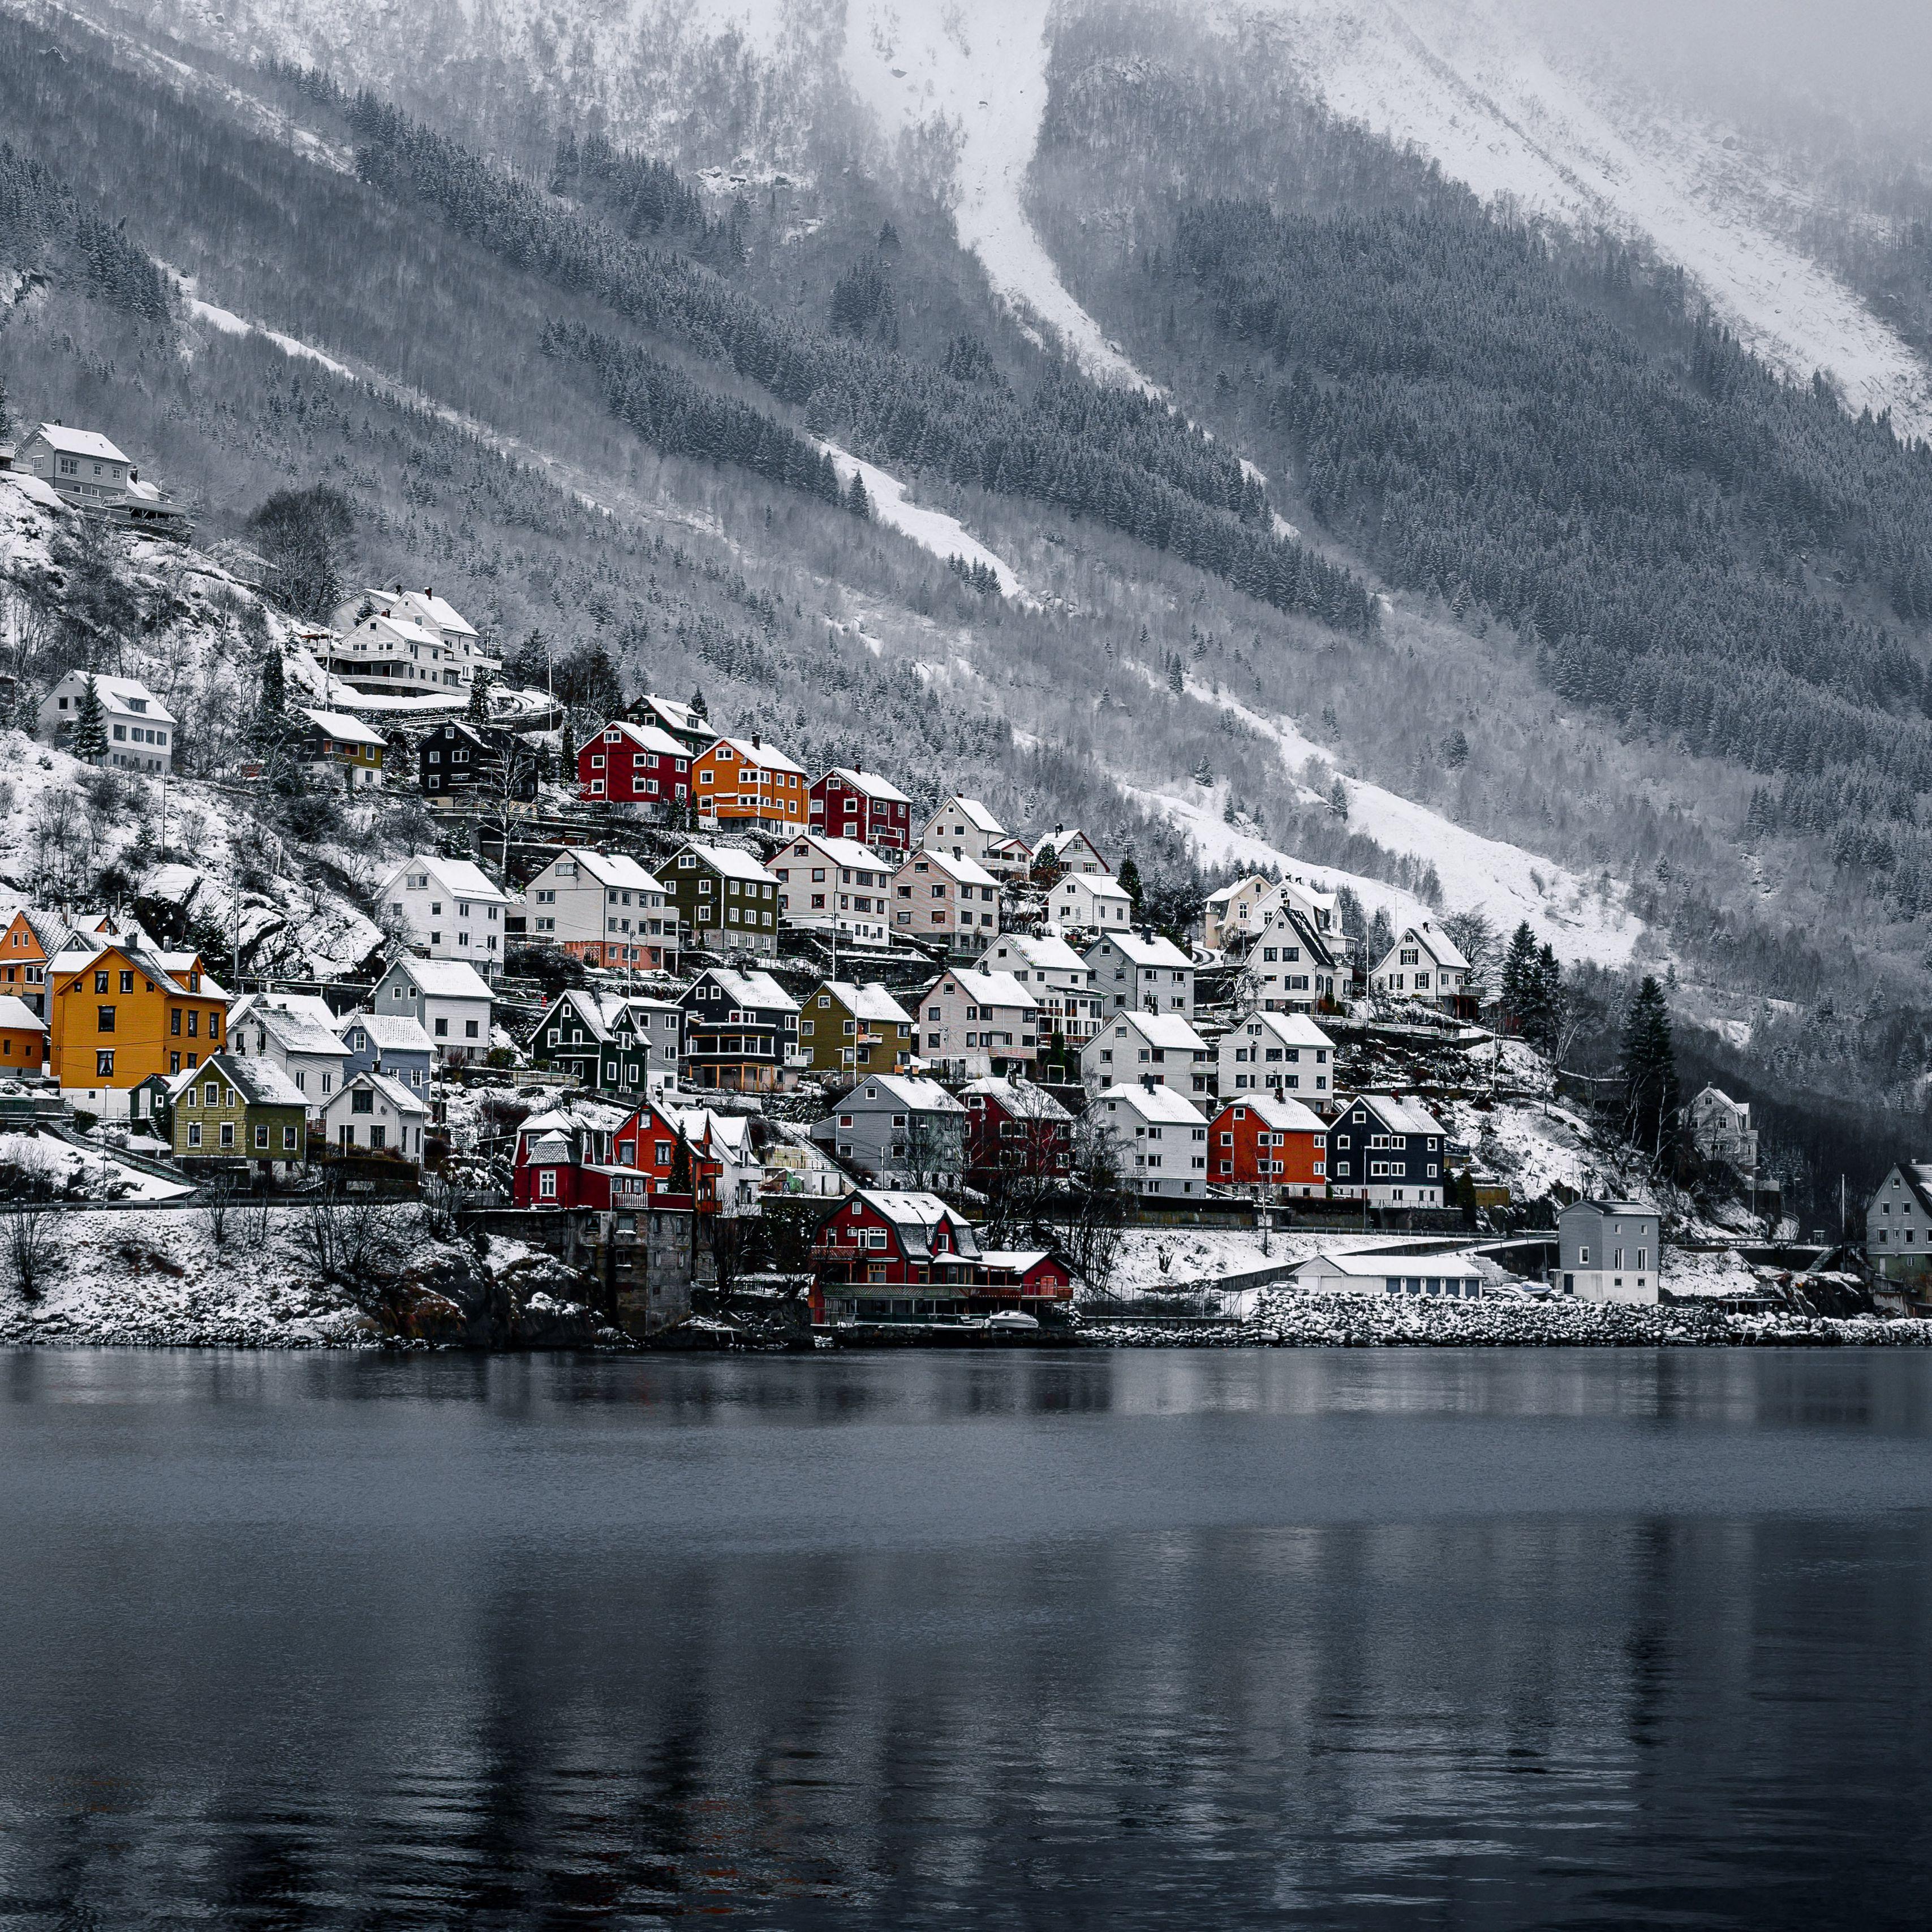 3415x3415 Wallpaper shore, house, water, lake, peak